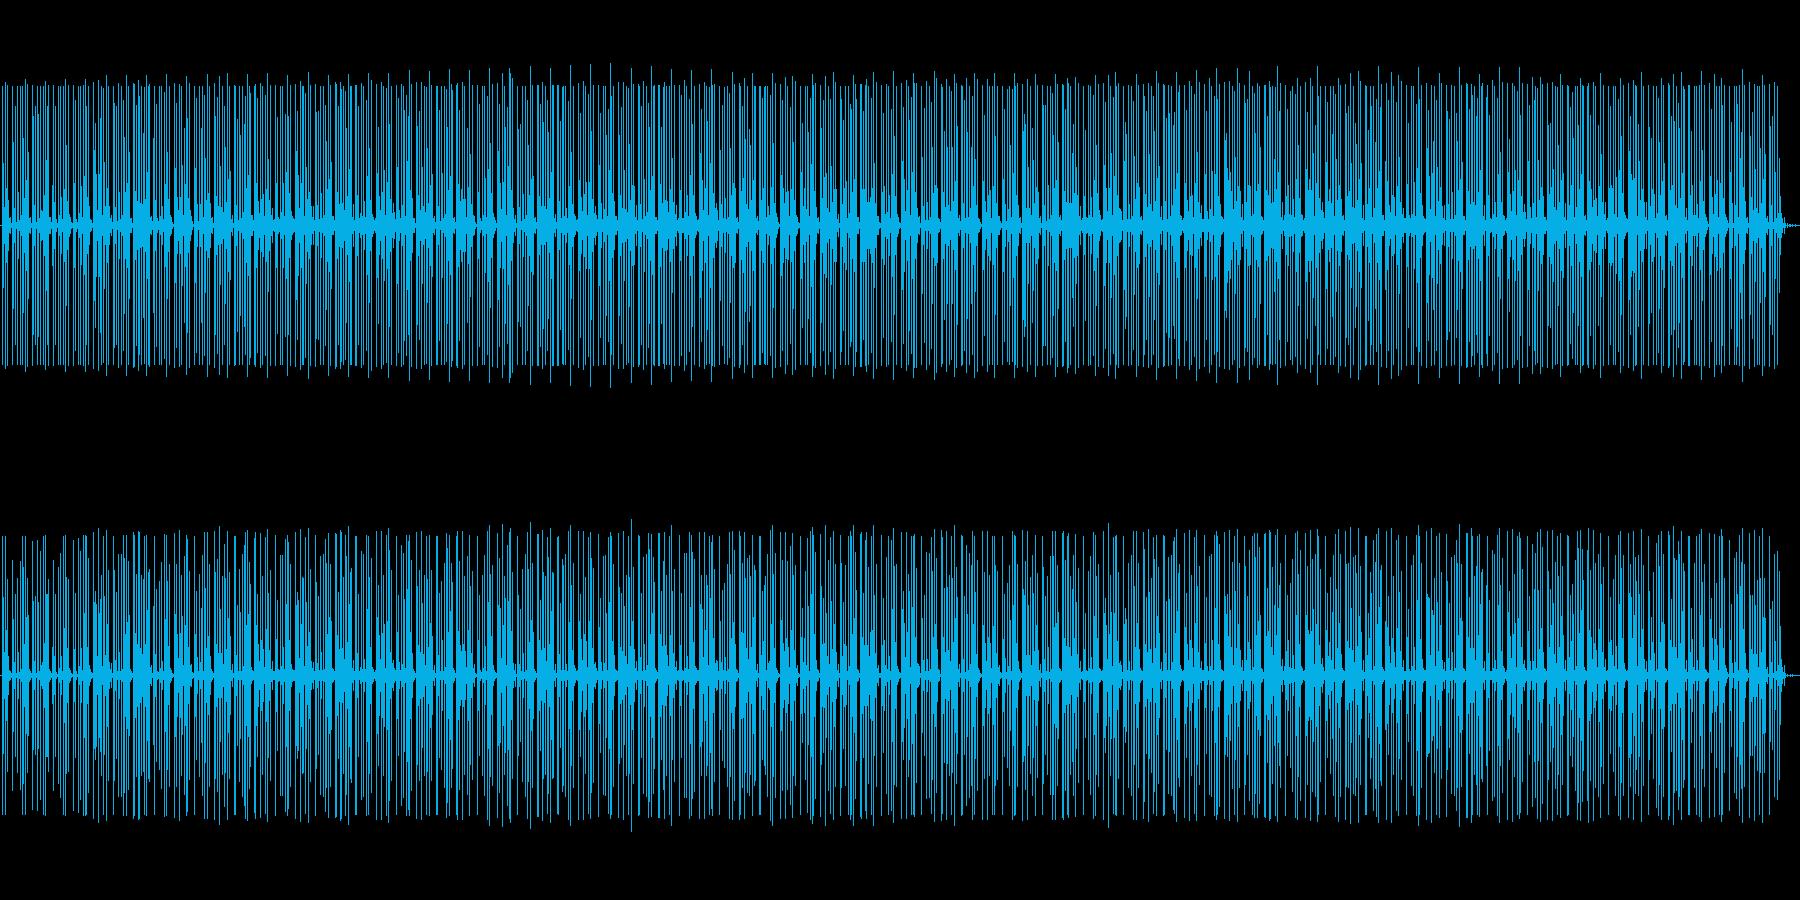 (˙꒳˙ᐢ)✋会話の邪魔にならない曲✋の再生済みの波形